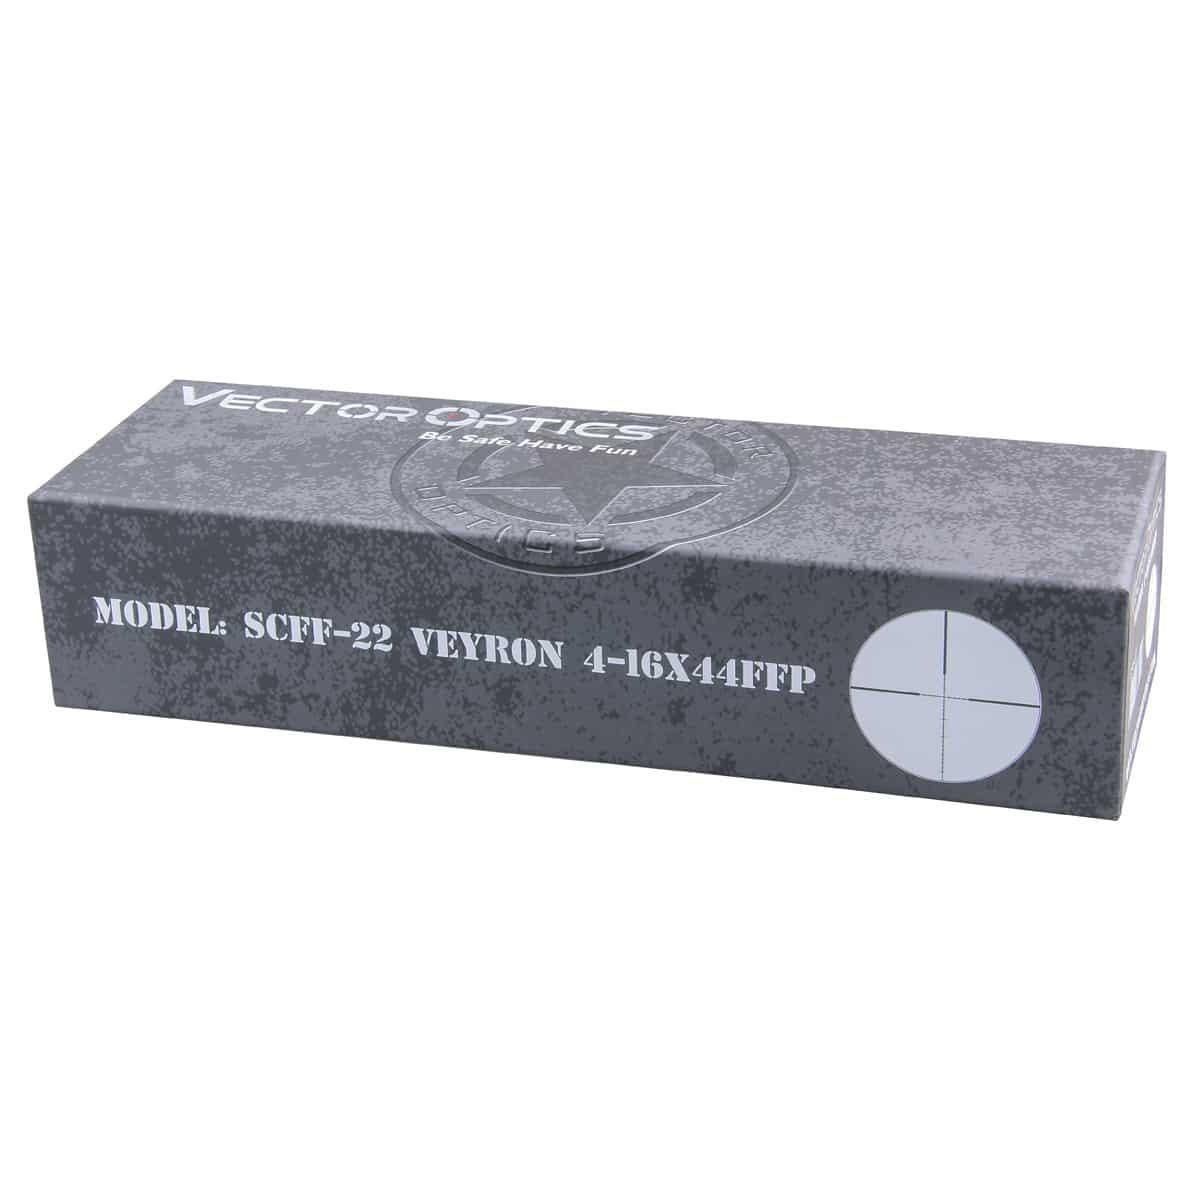 Veyron 4-16x44FFP Riflescope